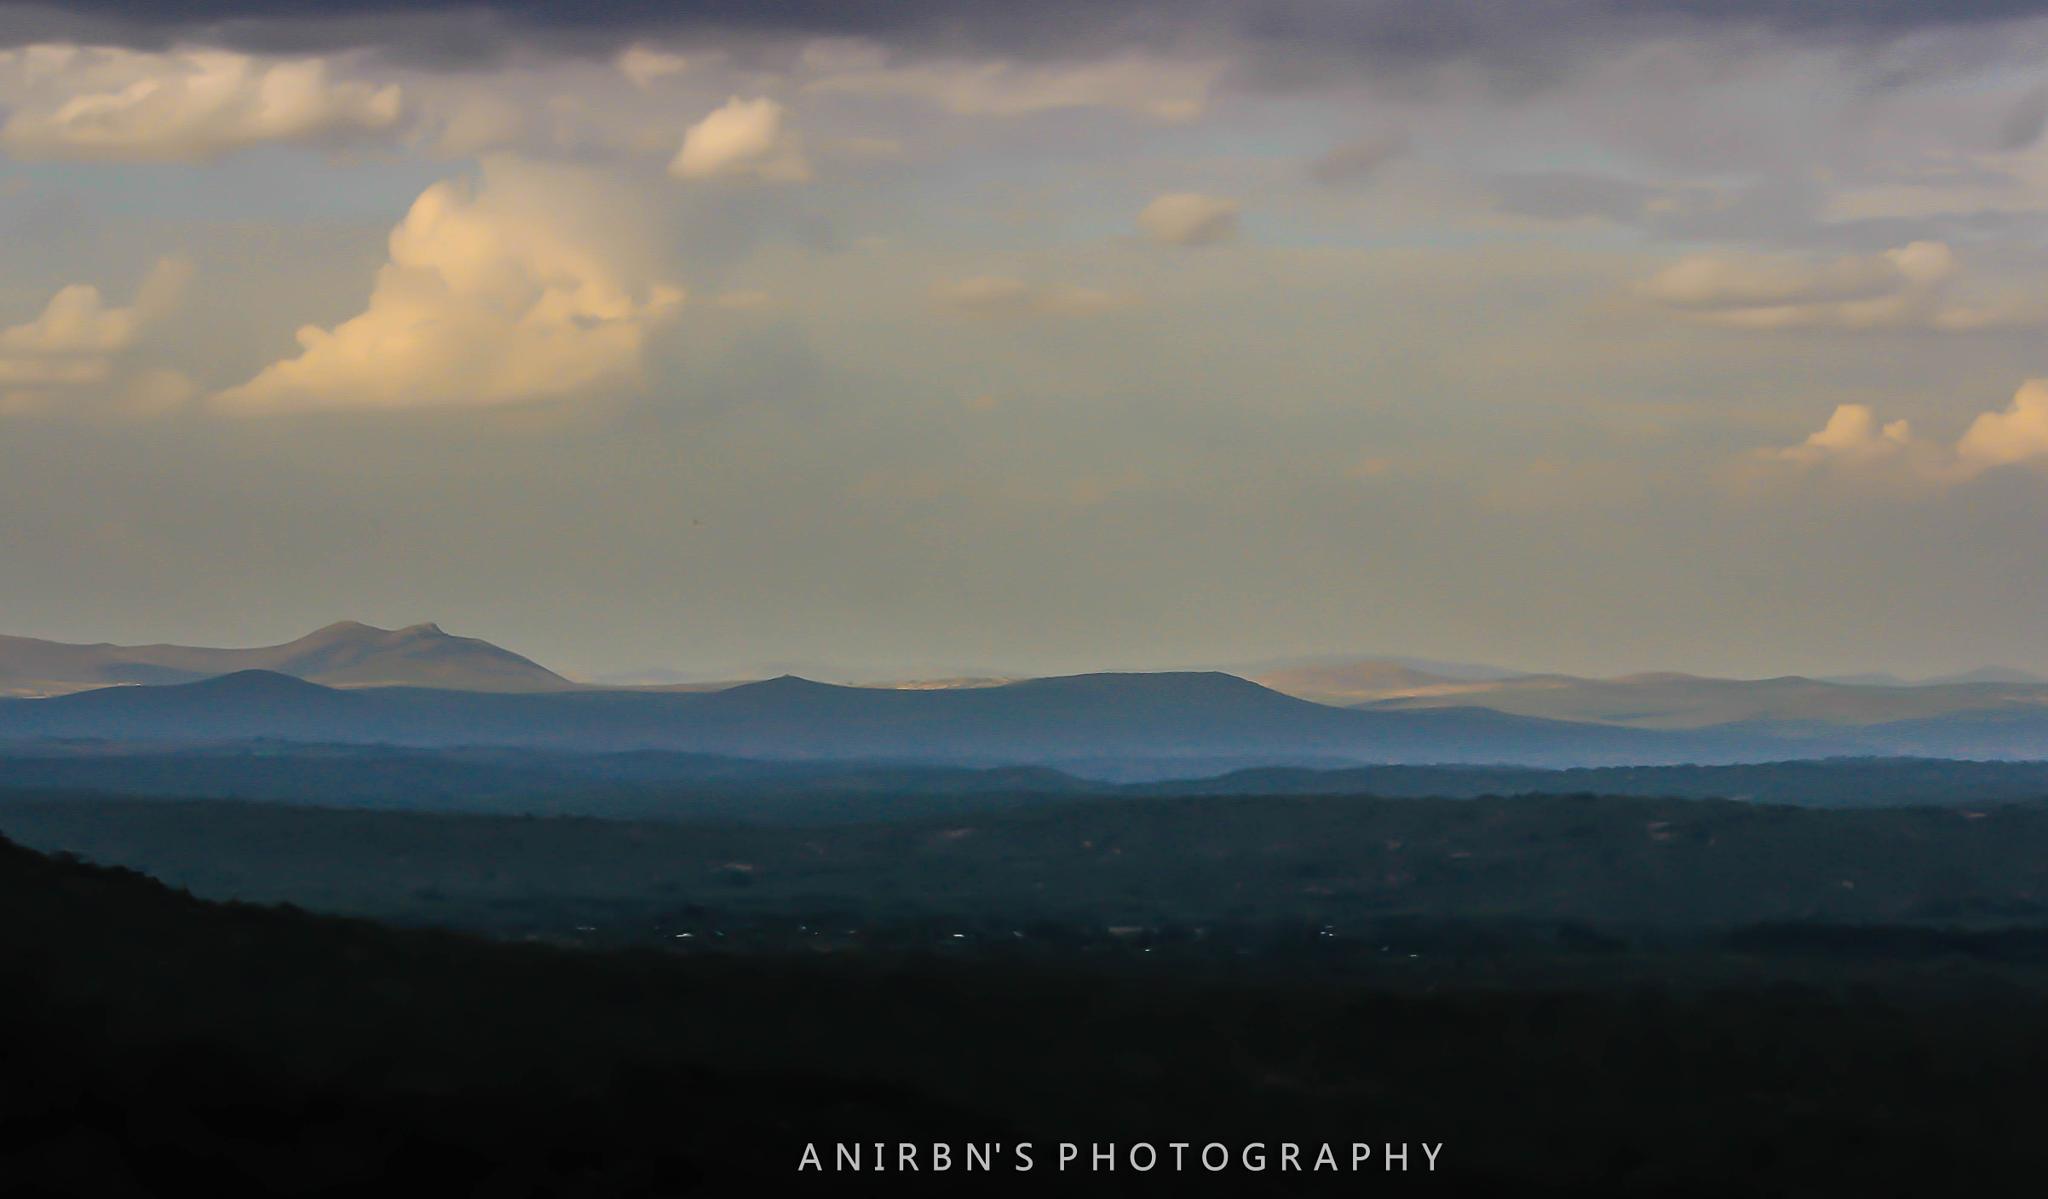 NILGIRIS by Anirban Banerjee